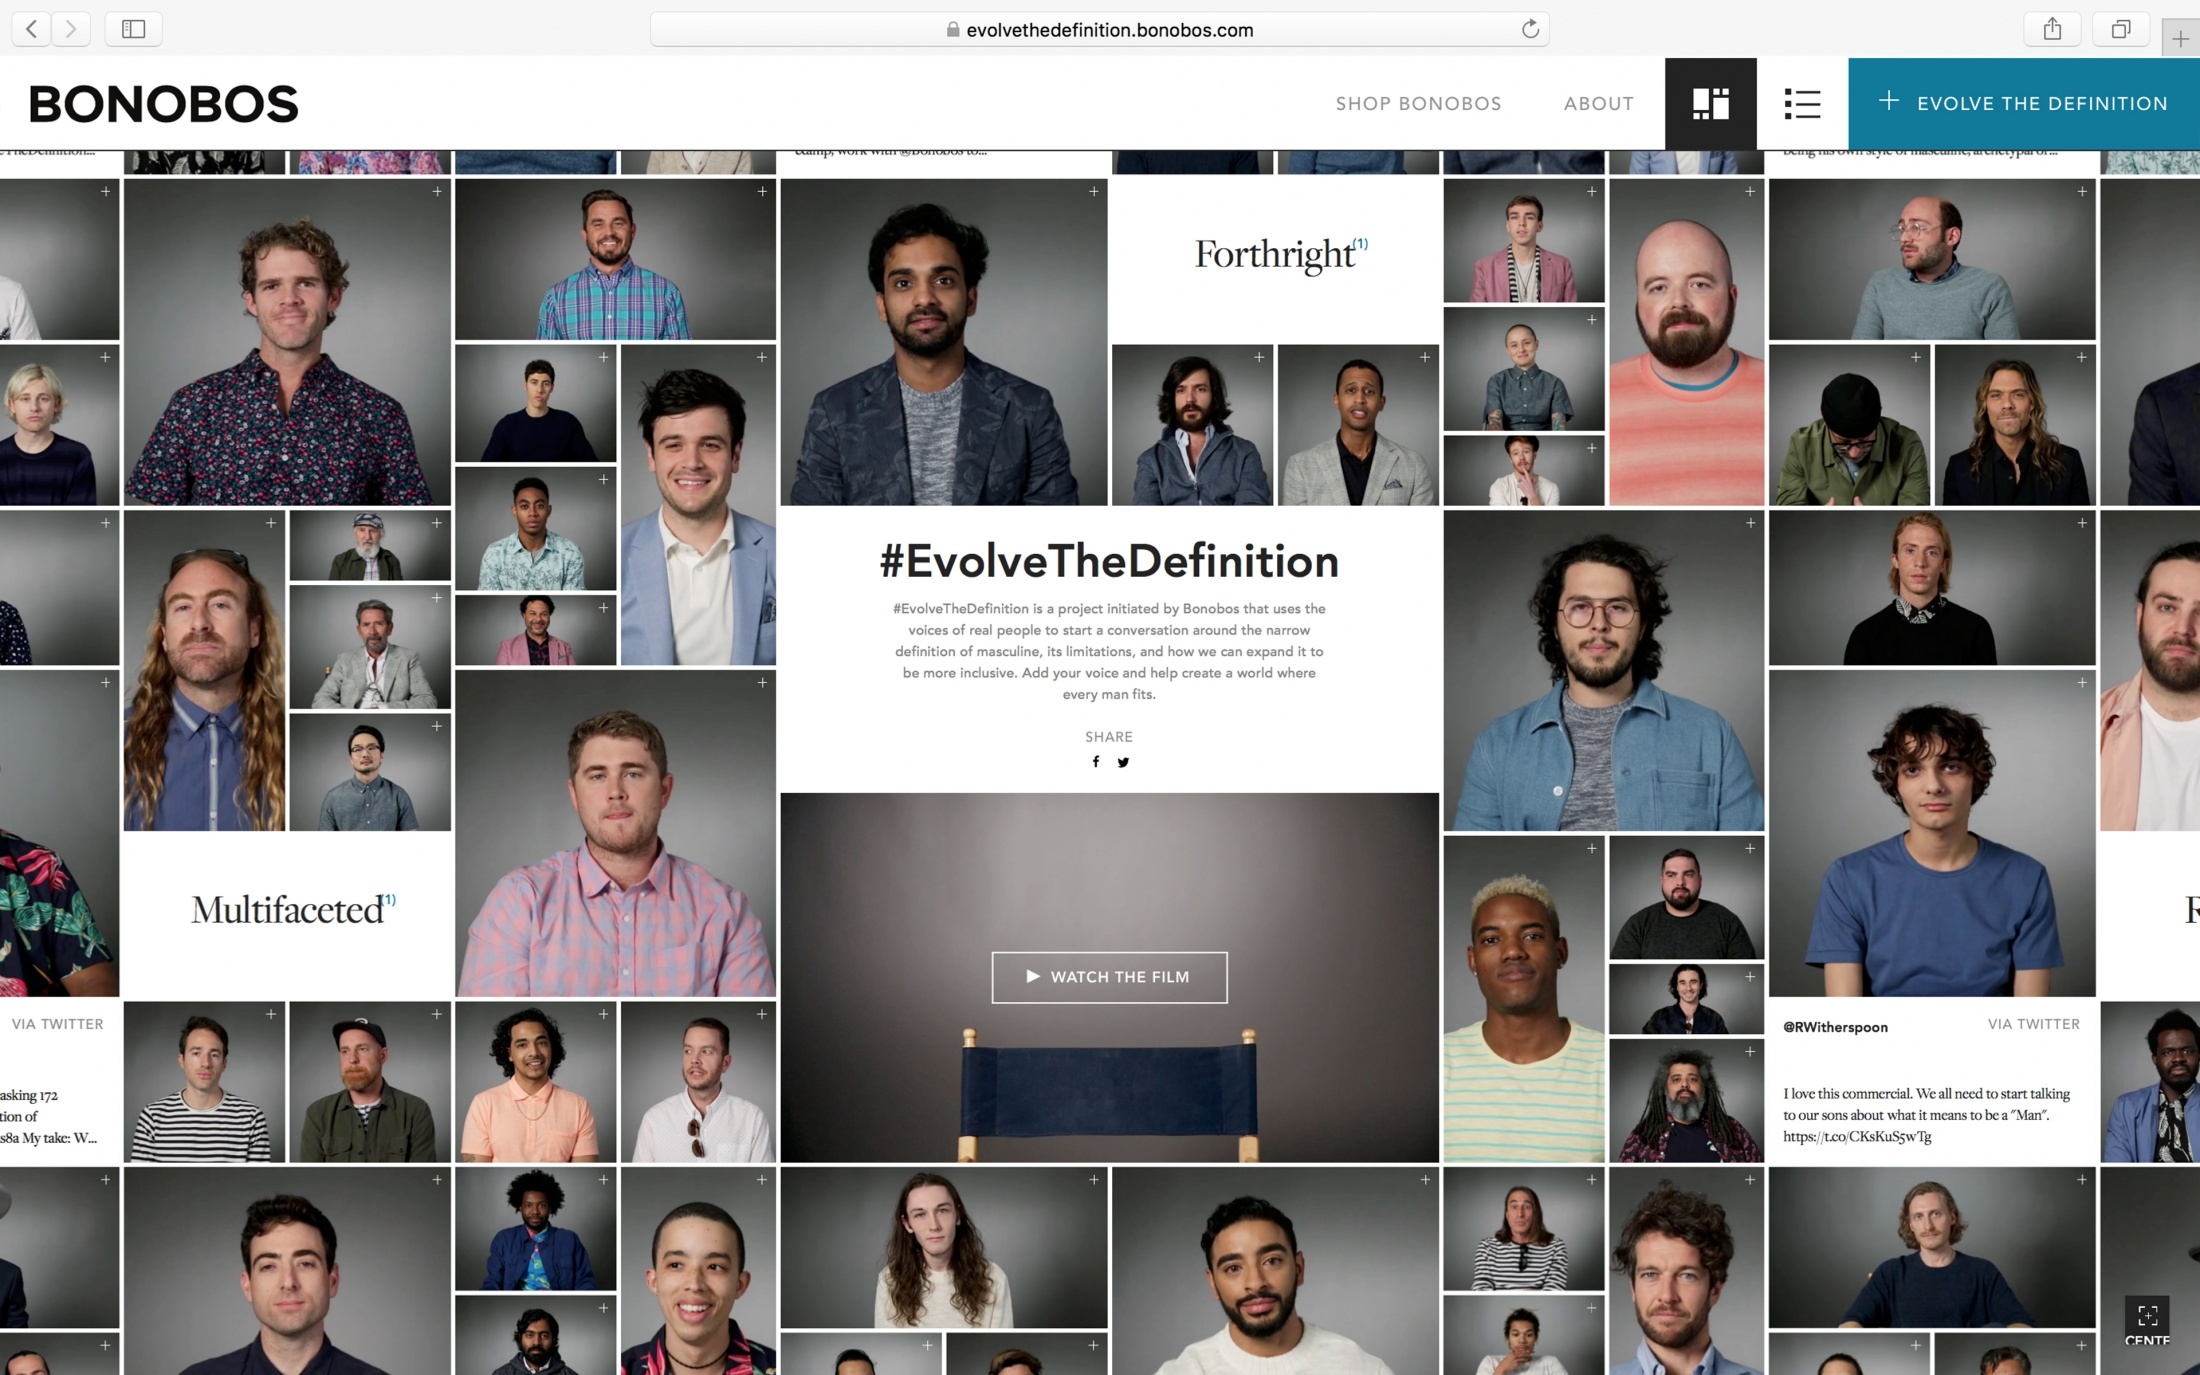 Thumbnail for #EvolveTheDefinition